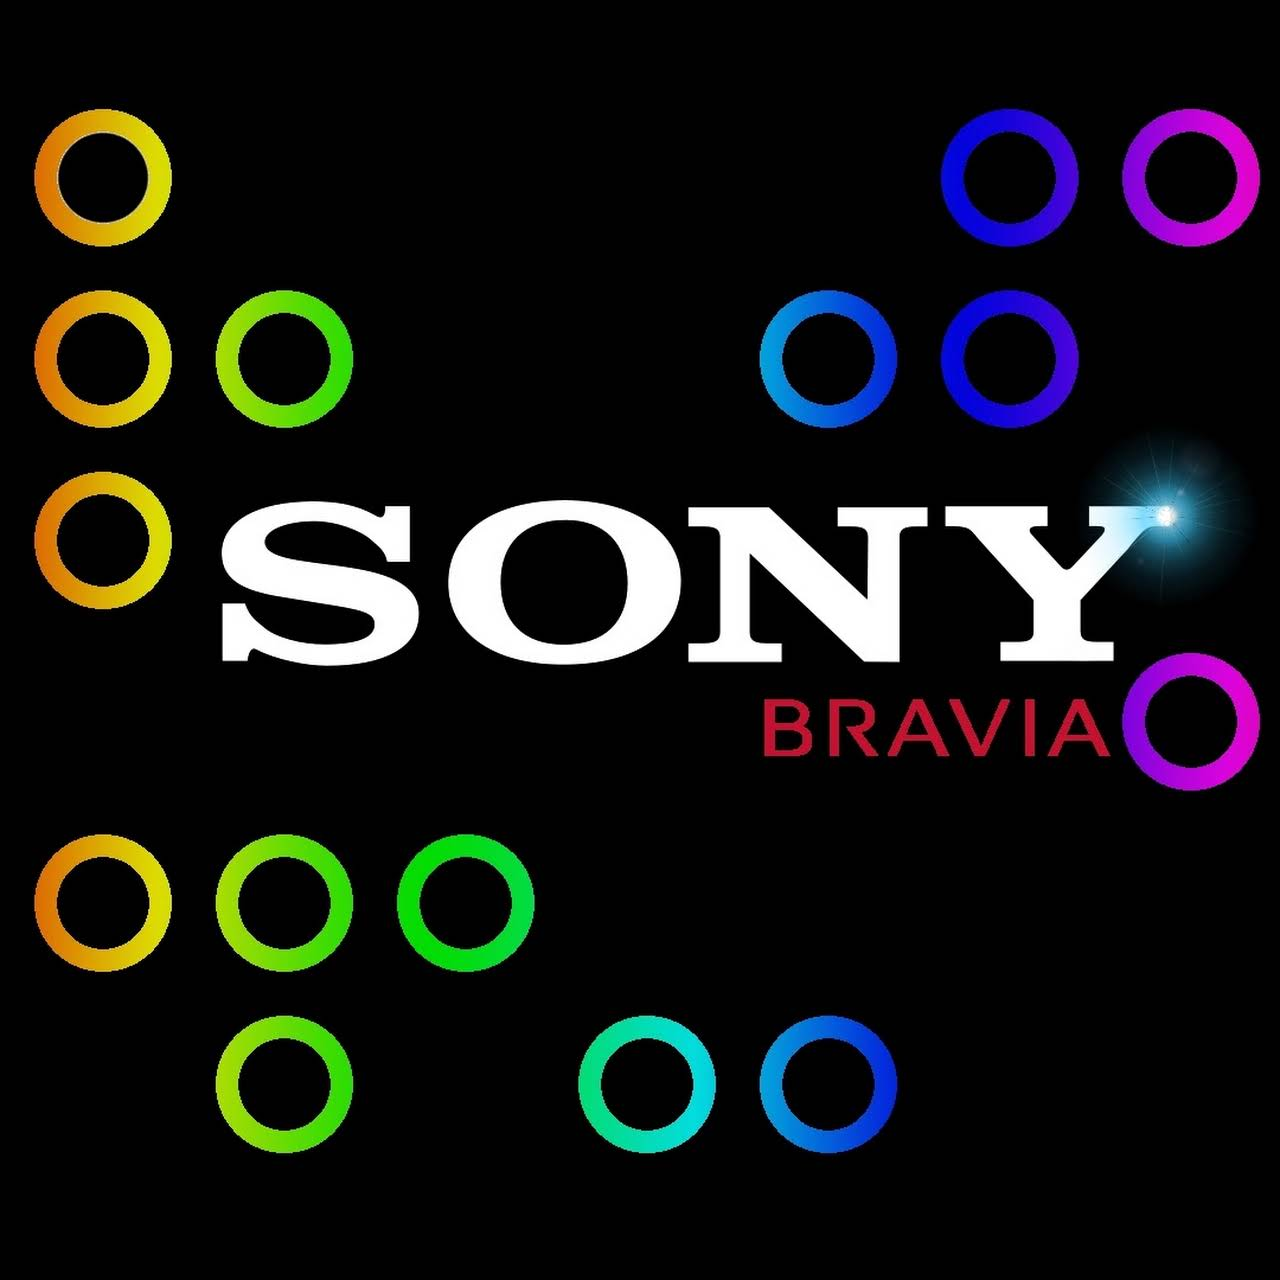 SONY SAMSUNG LG PANASONIC LED TV REPAIR SERVICE CENTRE IN